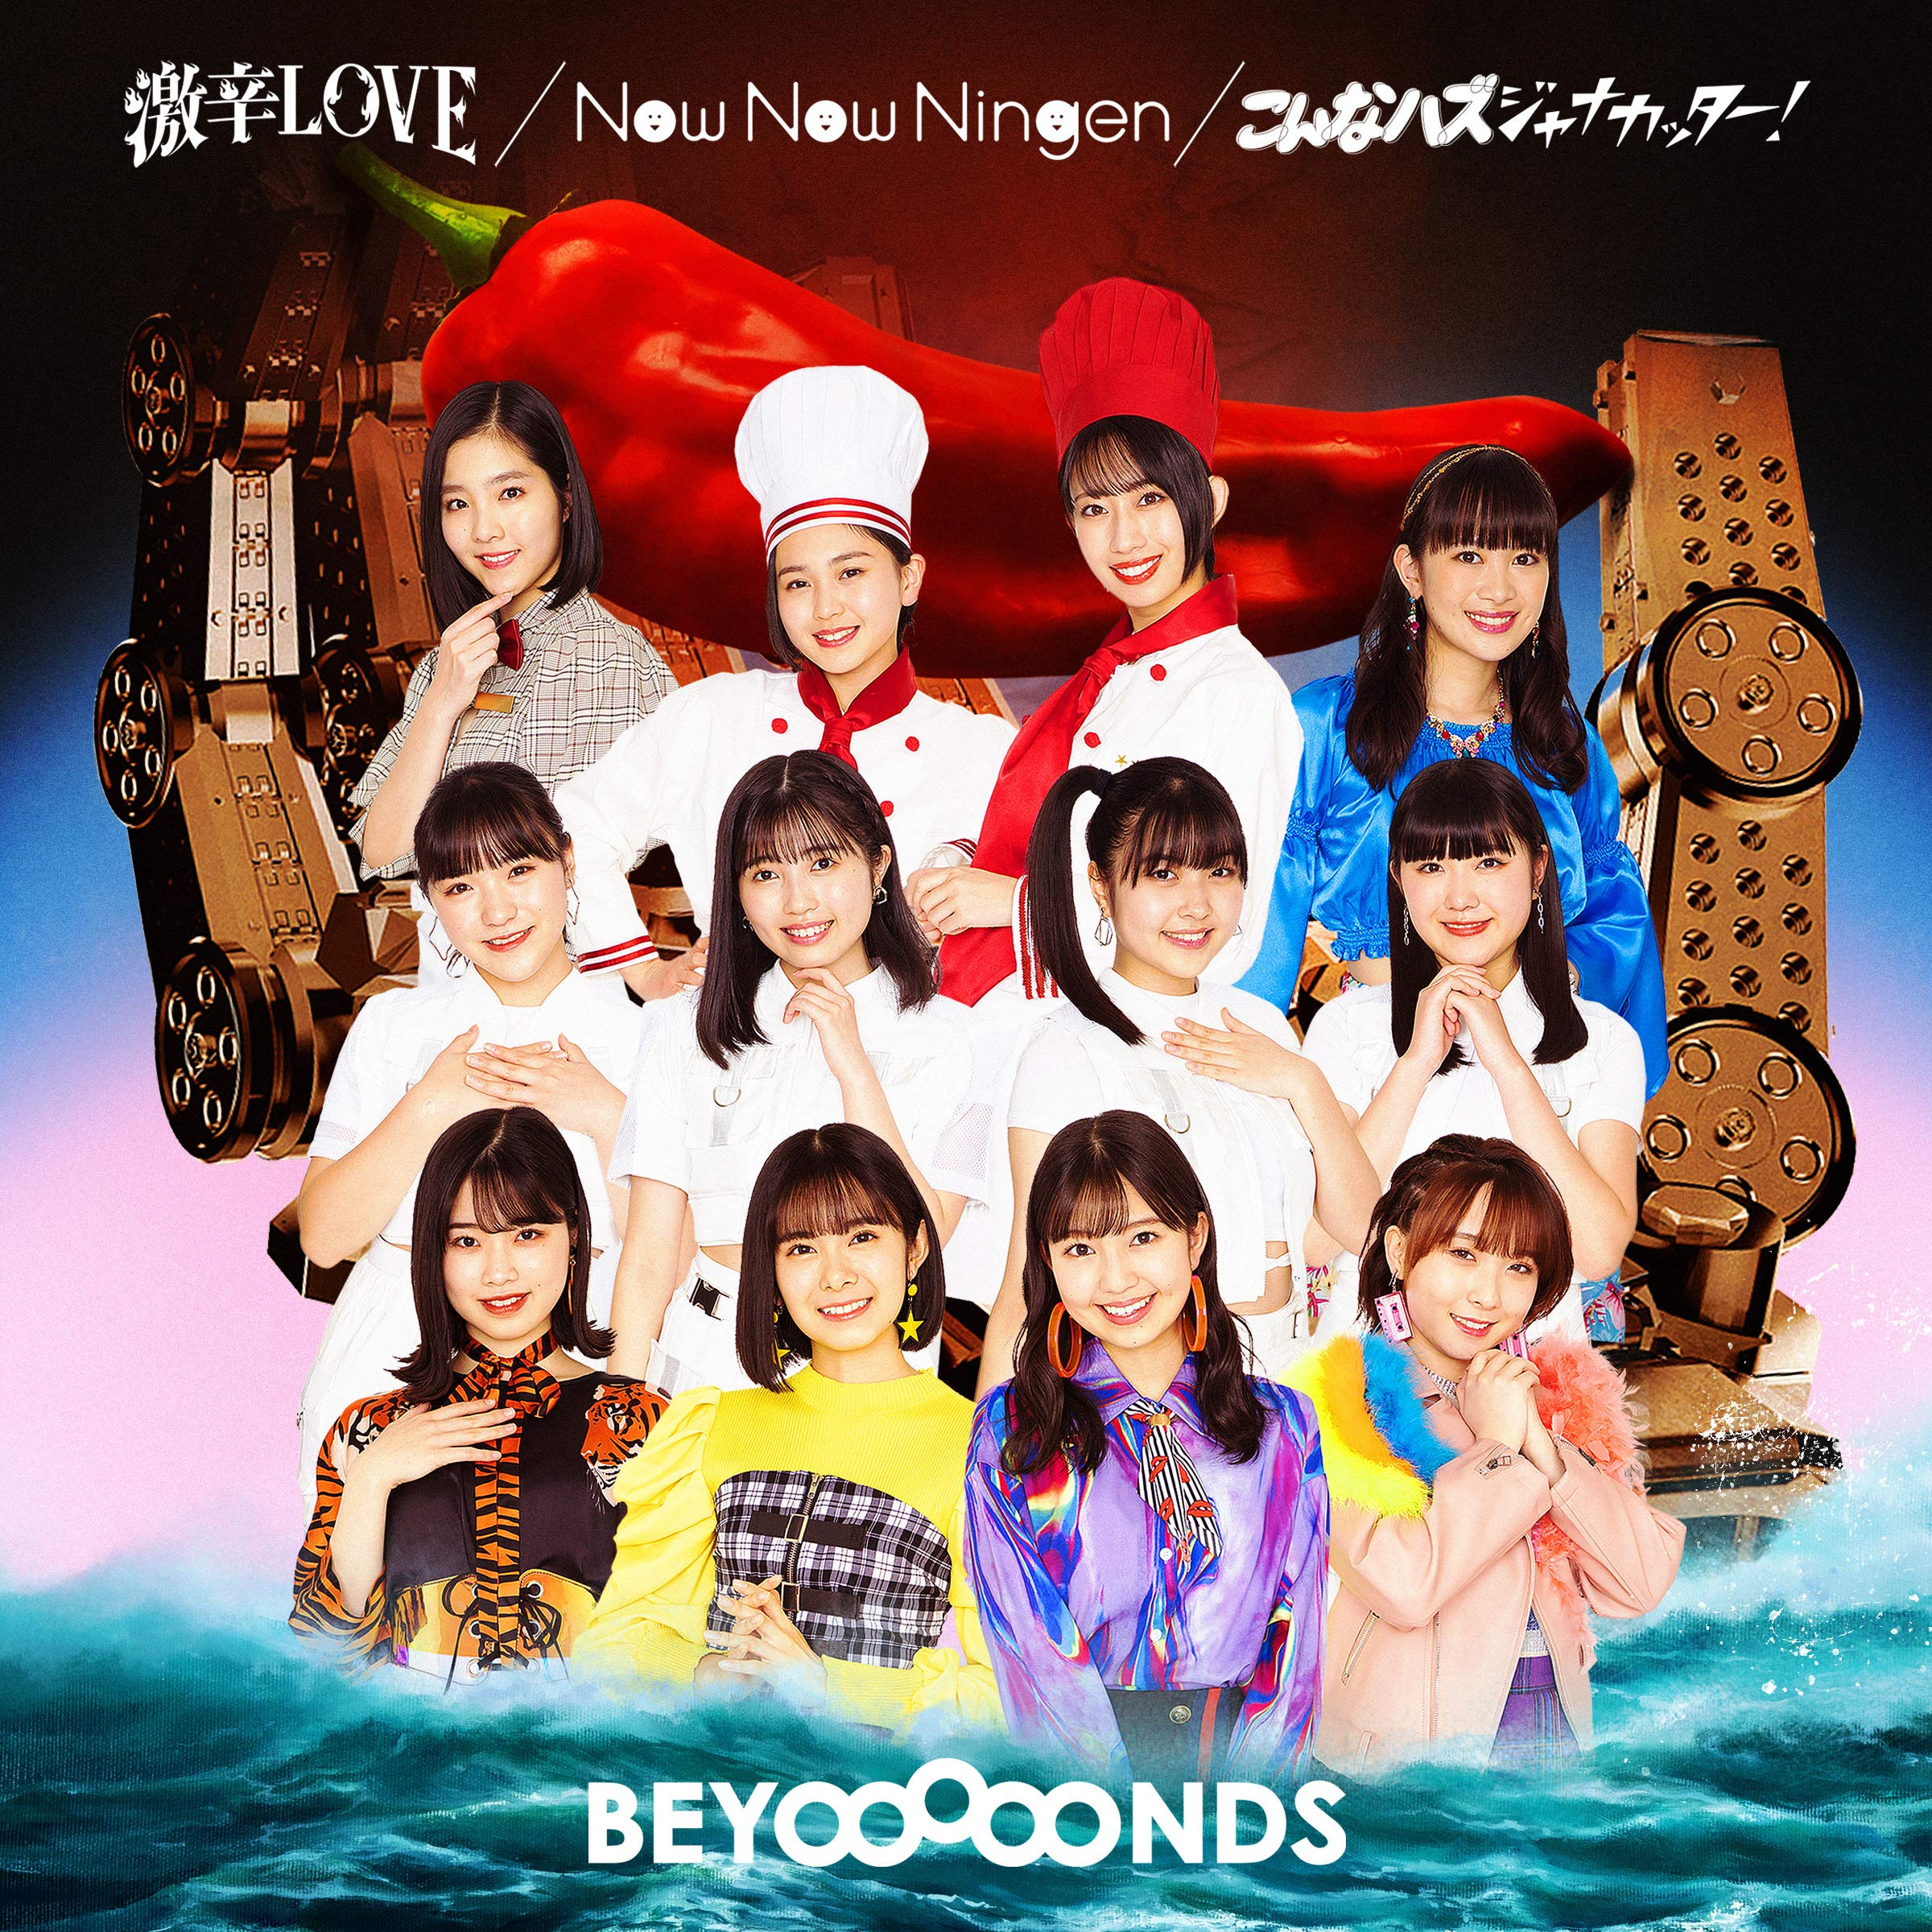 BEYOOOOONDS (ビヨーンズ) – 激辛LOVE / Now Now Ningen / こんなハズジャナカッター! [FLAC / 24bit Lossless / WEB] [2021.03.03]